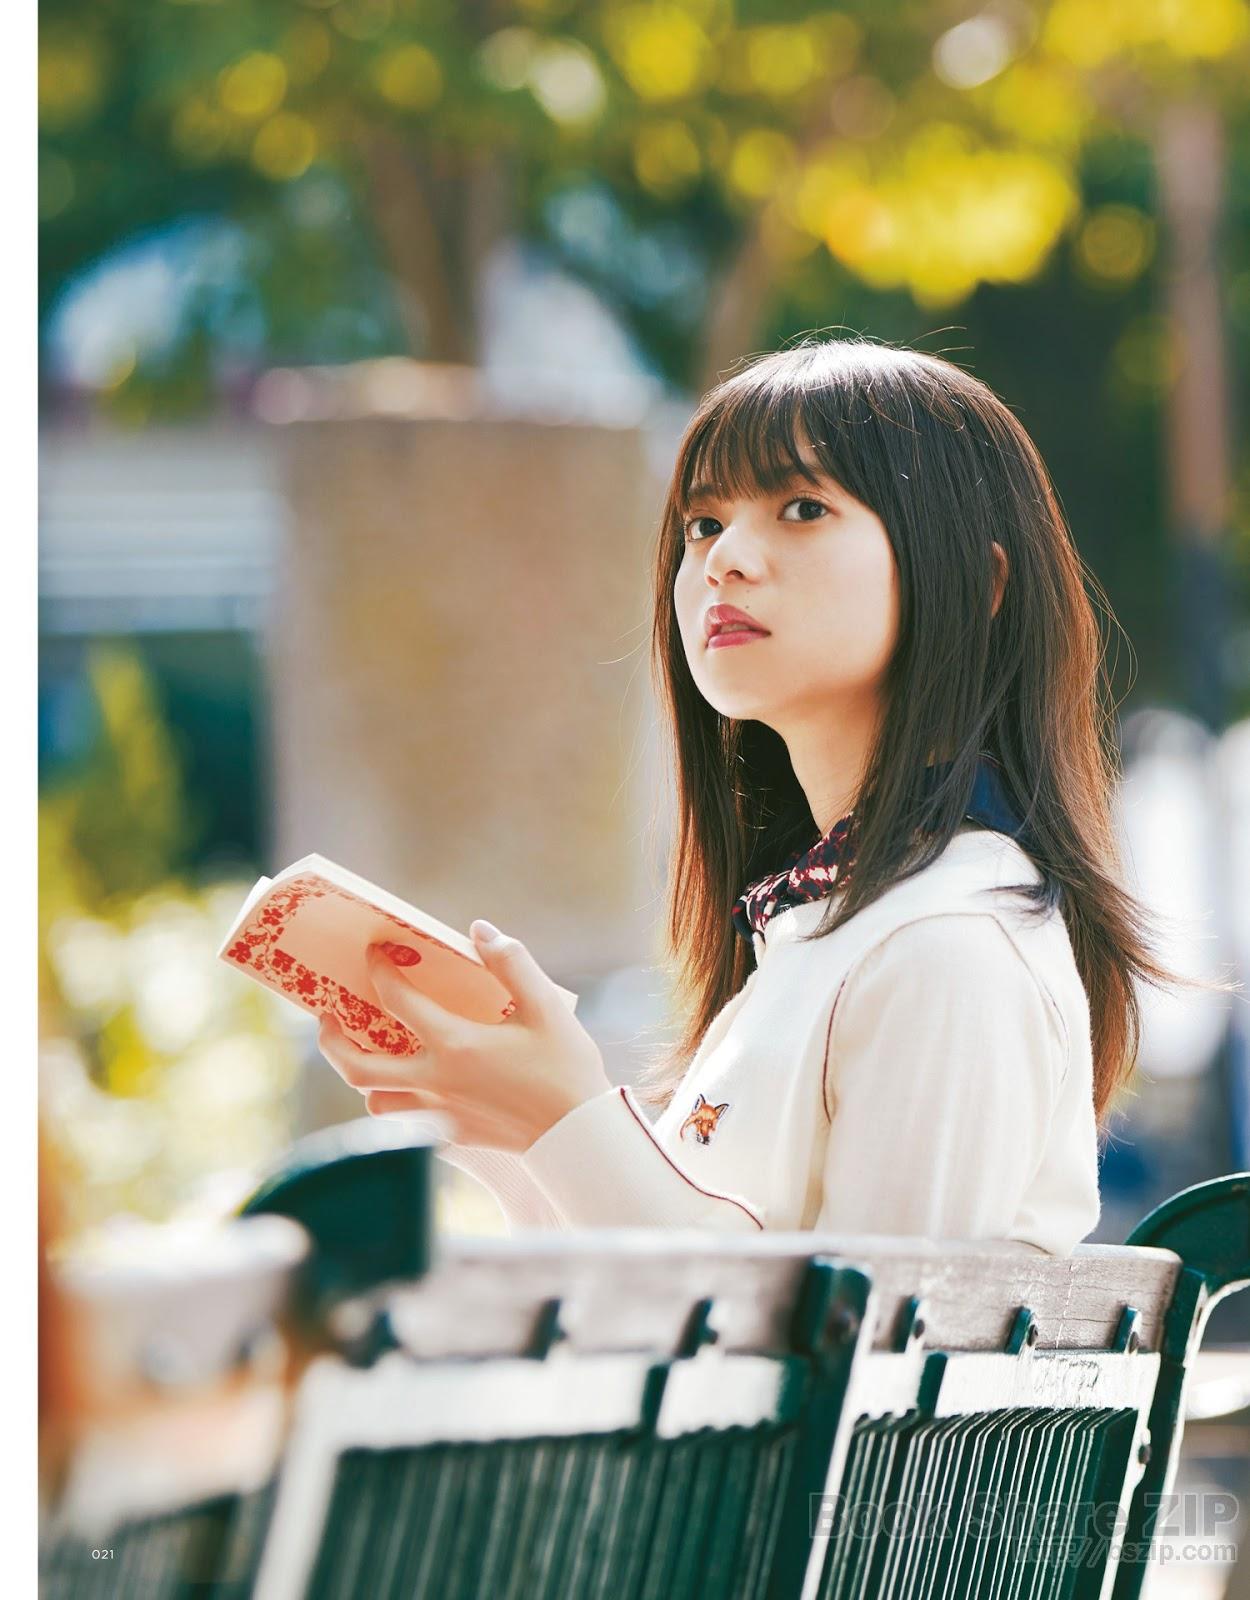 Saito Asuka 齋藤飛鳥, Hanako 2017.10.26 No.1143 (ハナコ 2017年10月26日号)